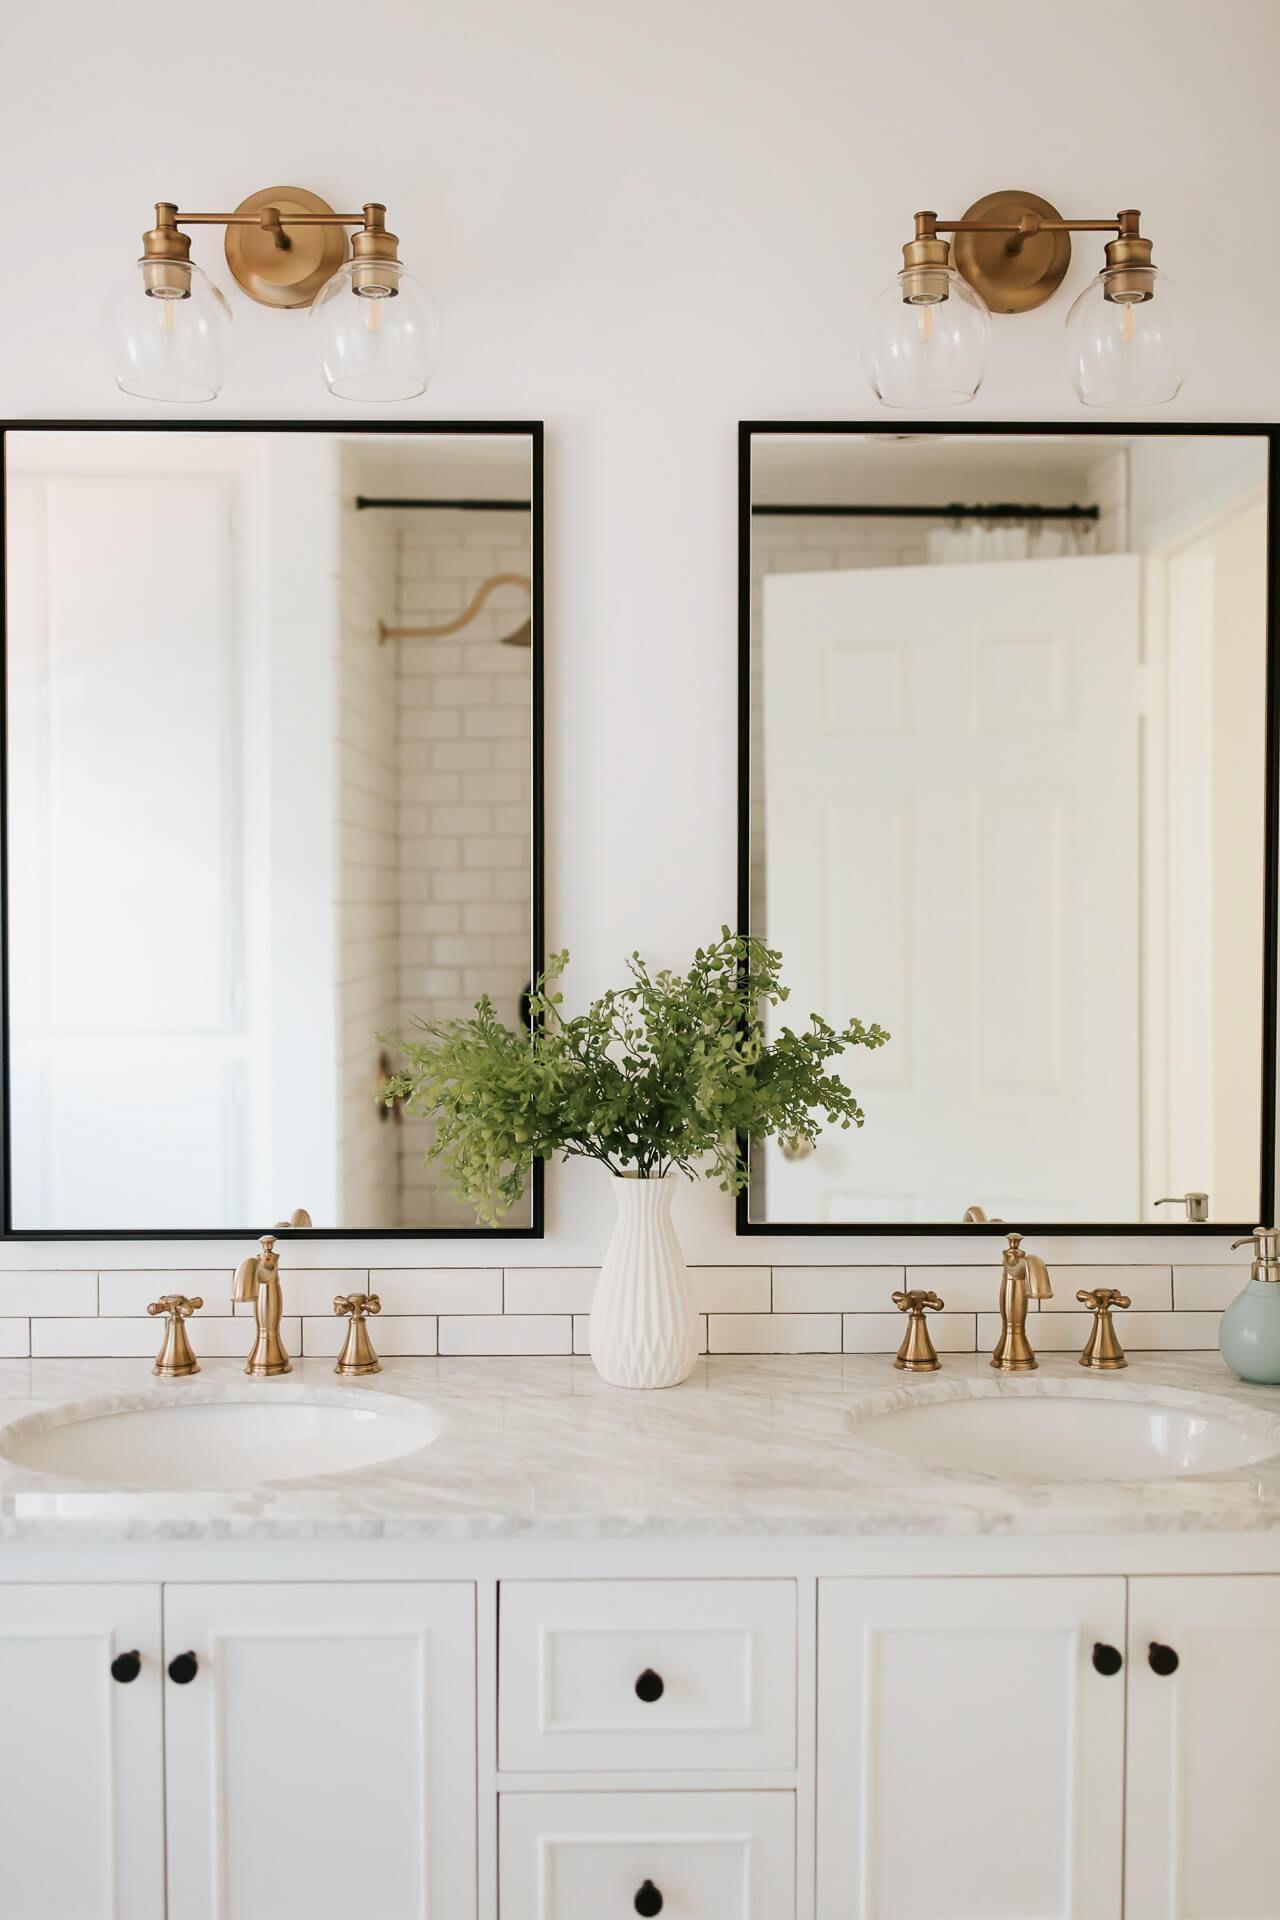 Before & After: Our Kids' Bathroom Design   M Loves M